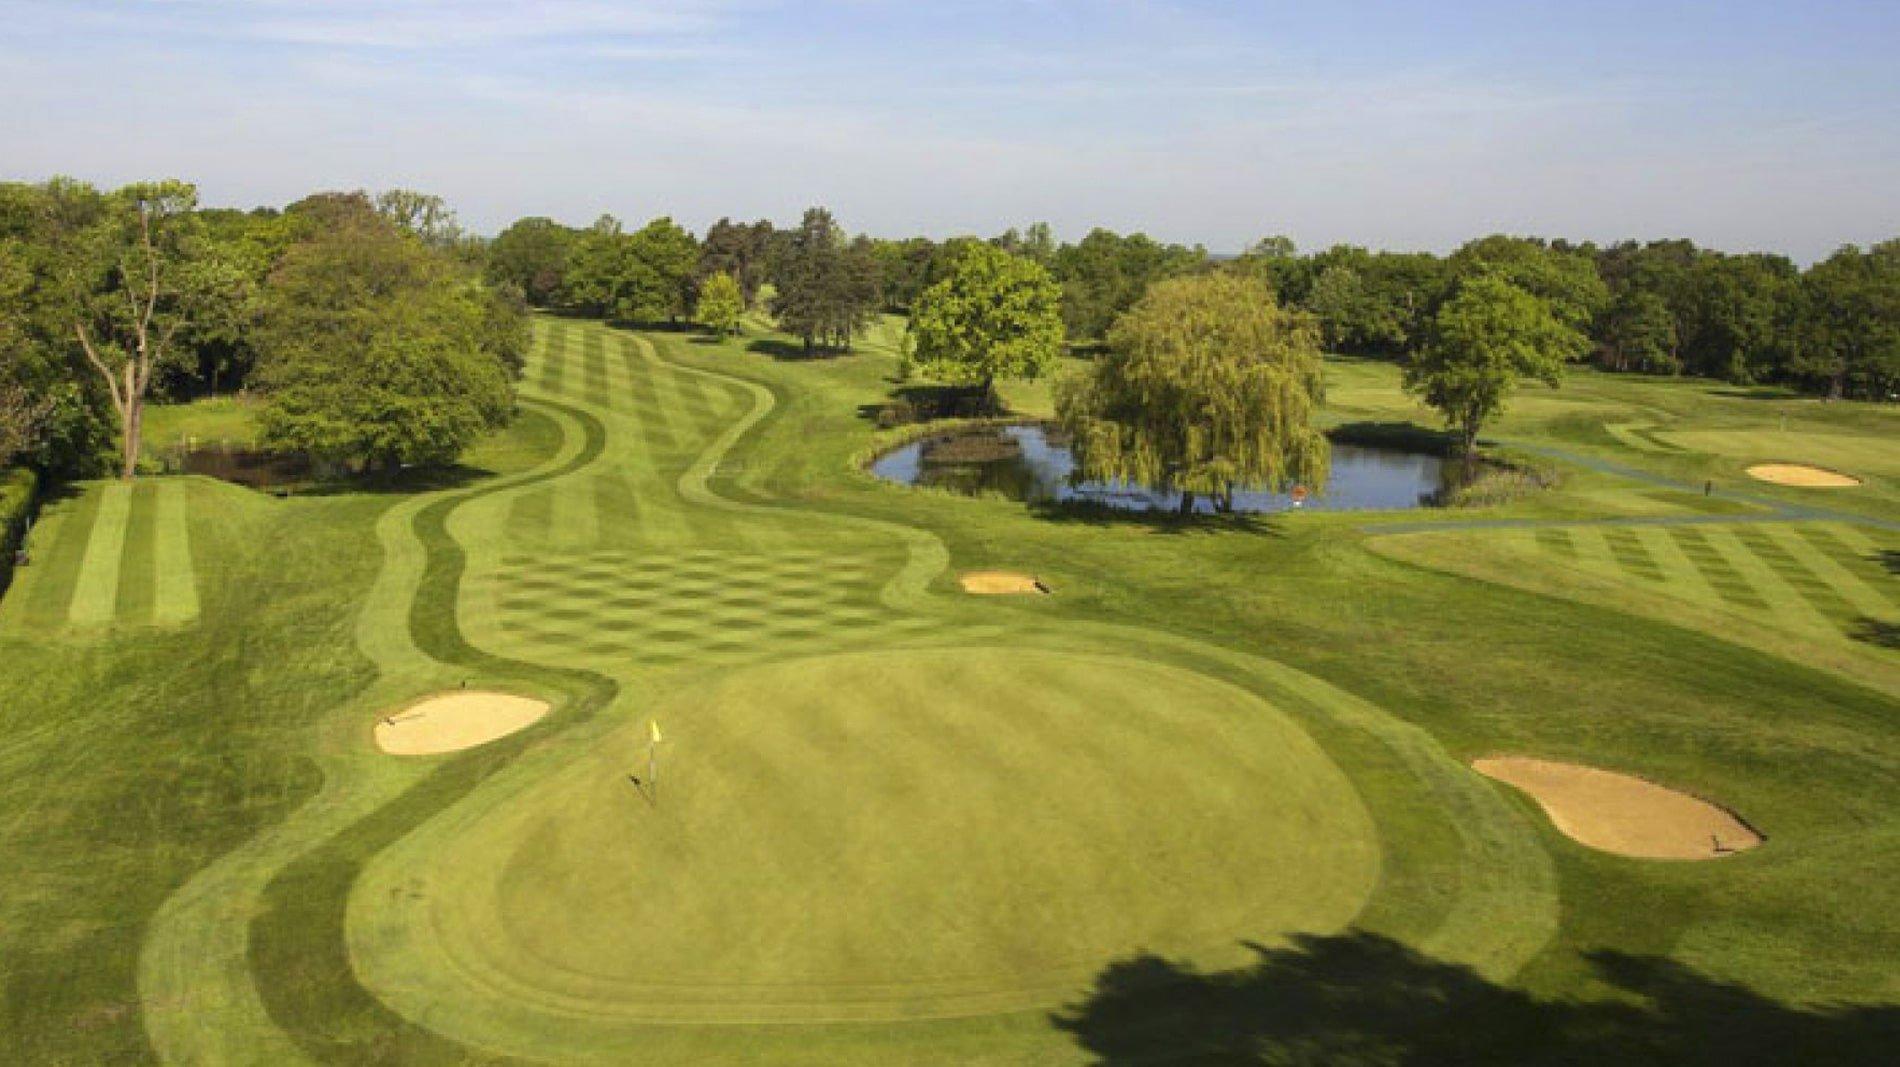 Dale Hill Golf Course